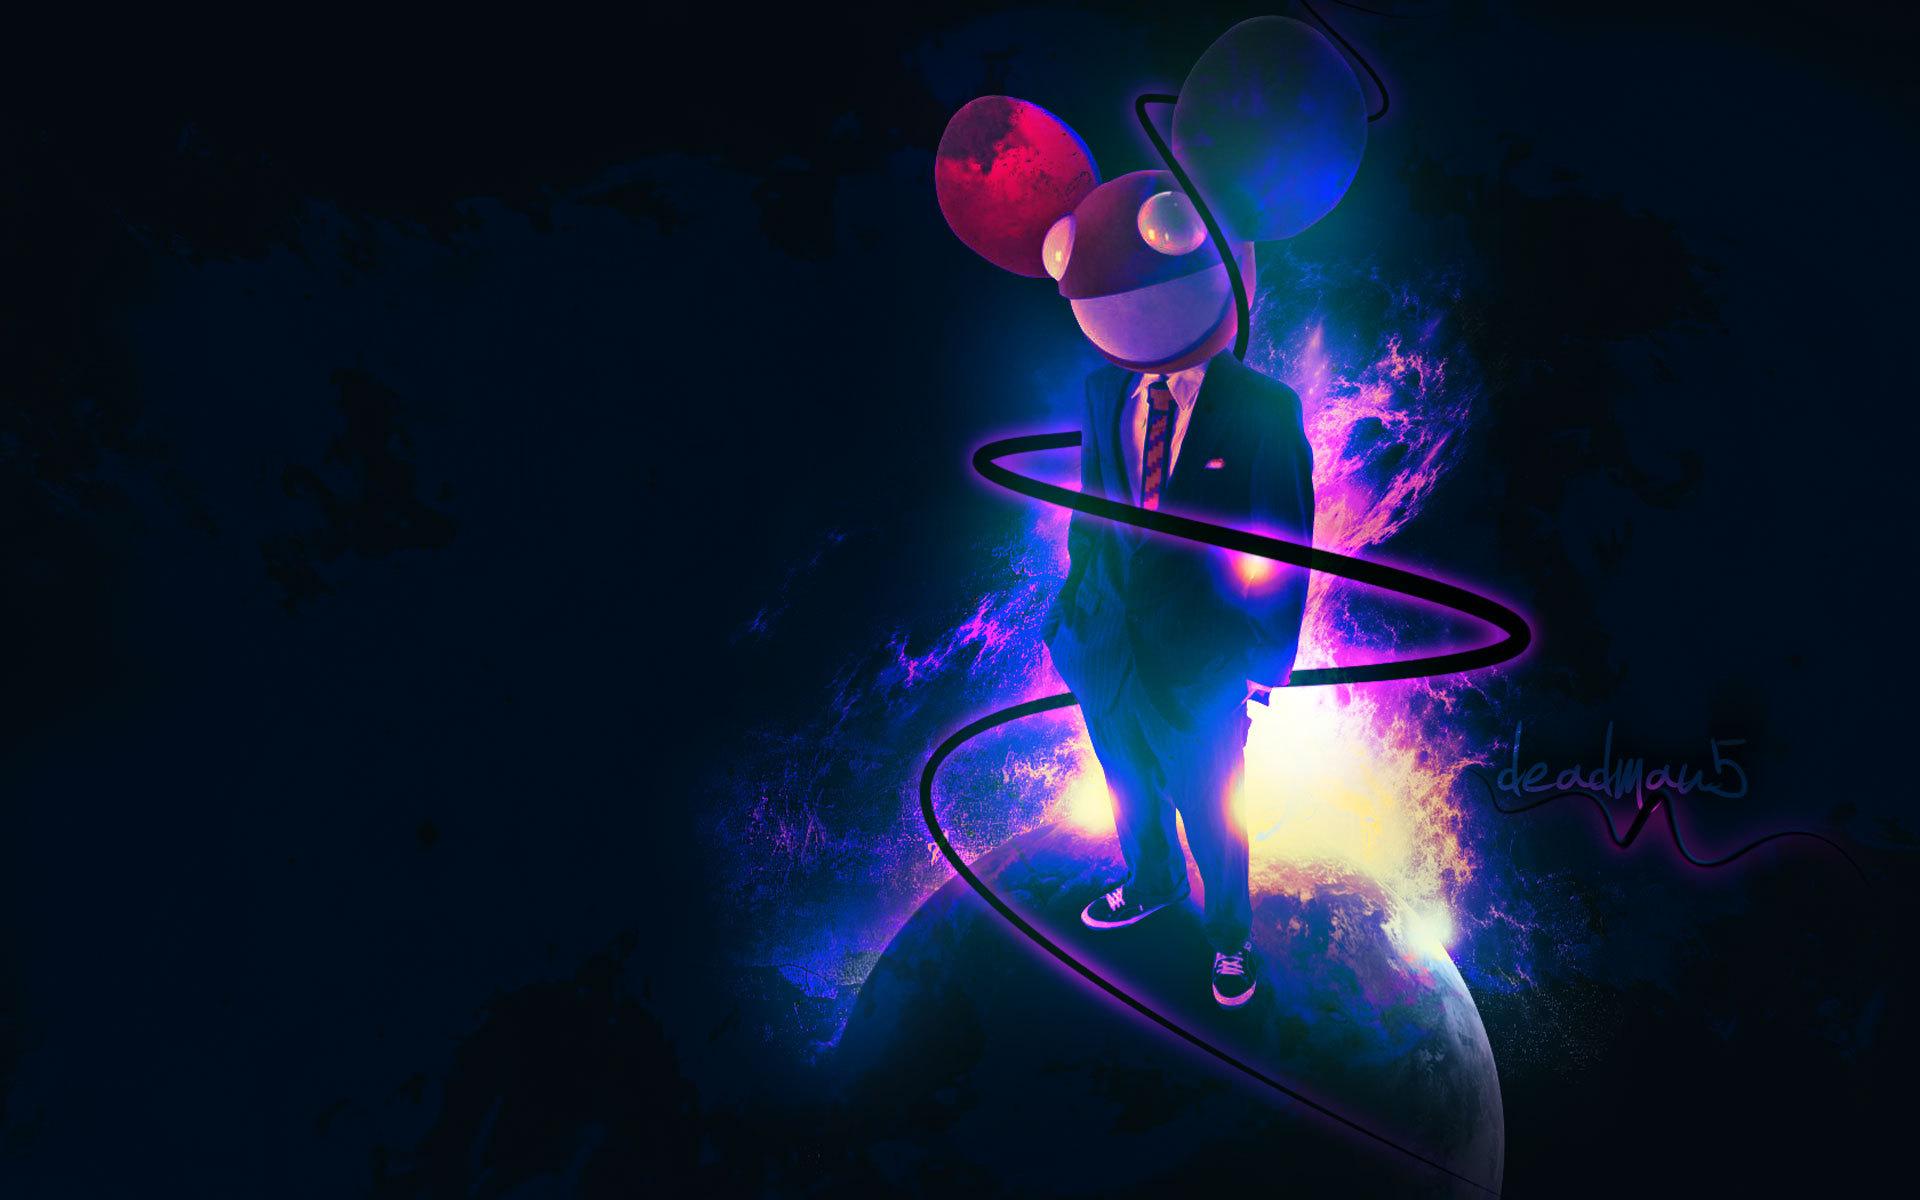 Pictures Of Deadmau5